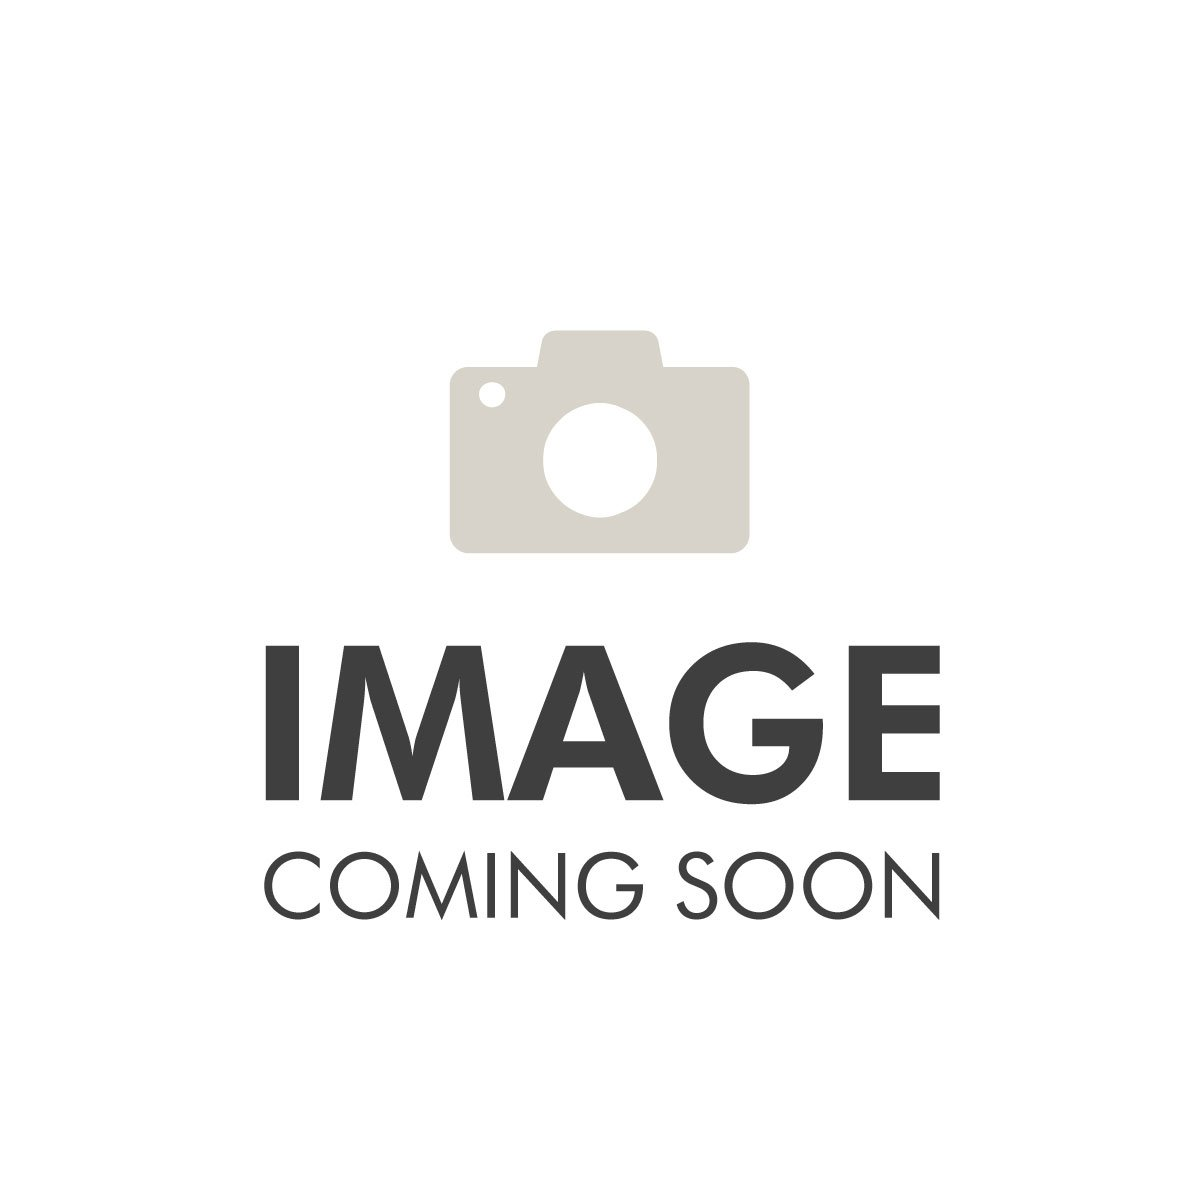 Schermasport - Foil Point Springs (10-Pack)